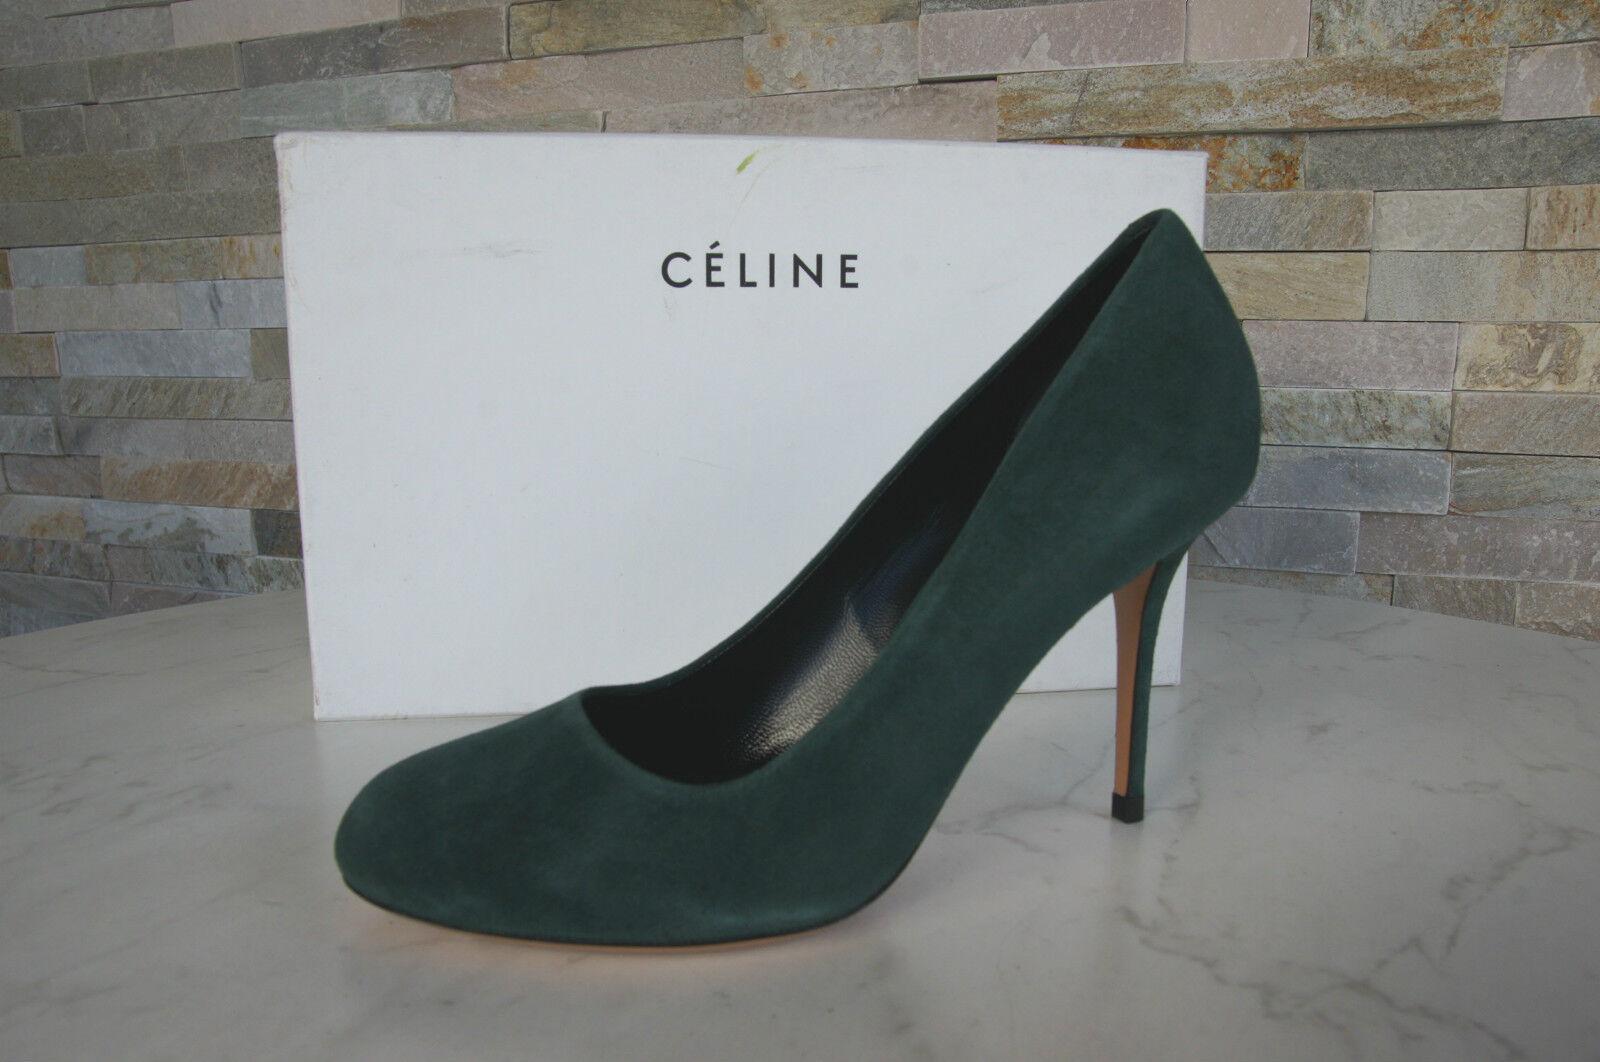 CELINE CÉLINE Paris Gr Gr Gr 36,5 Pumps Heels grün Leder Schuhe NEU ehem. f7bf5f